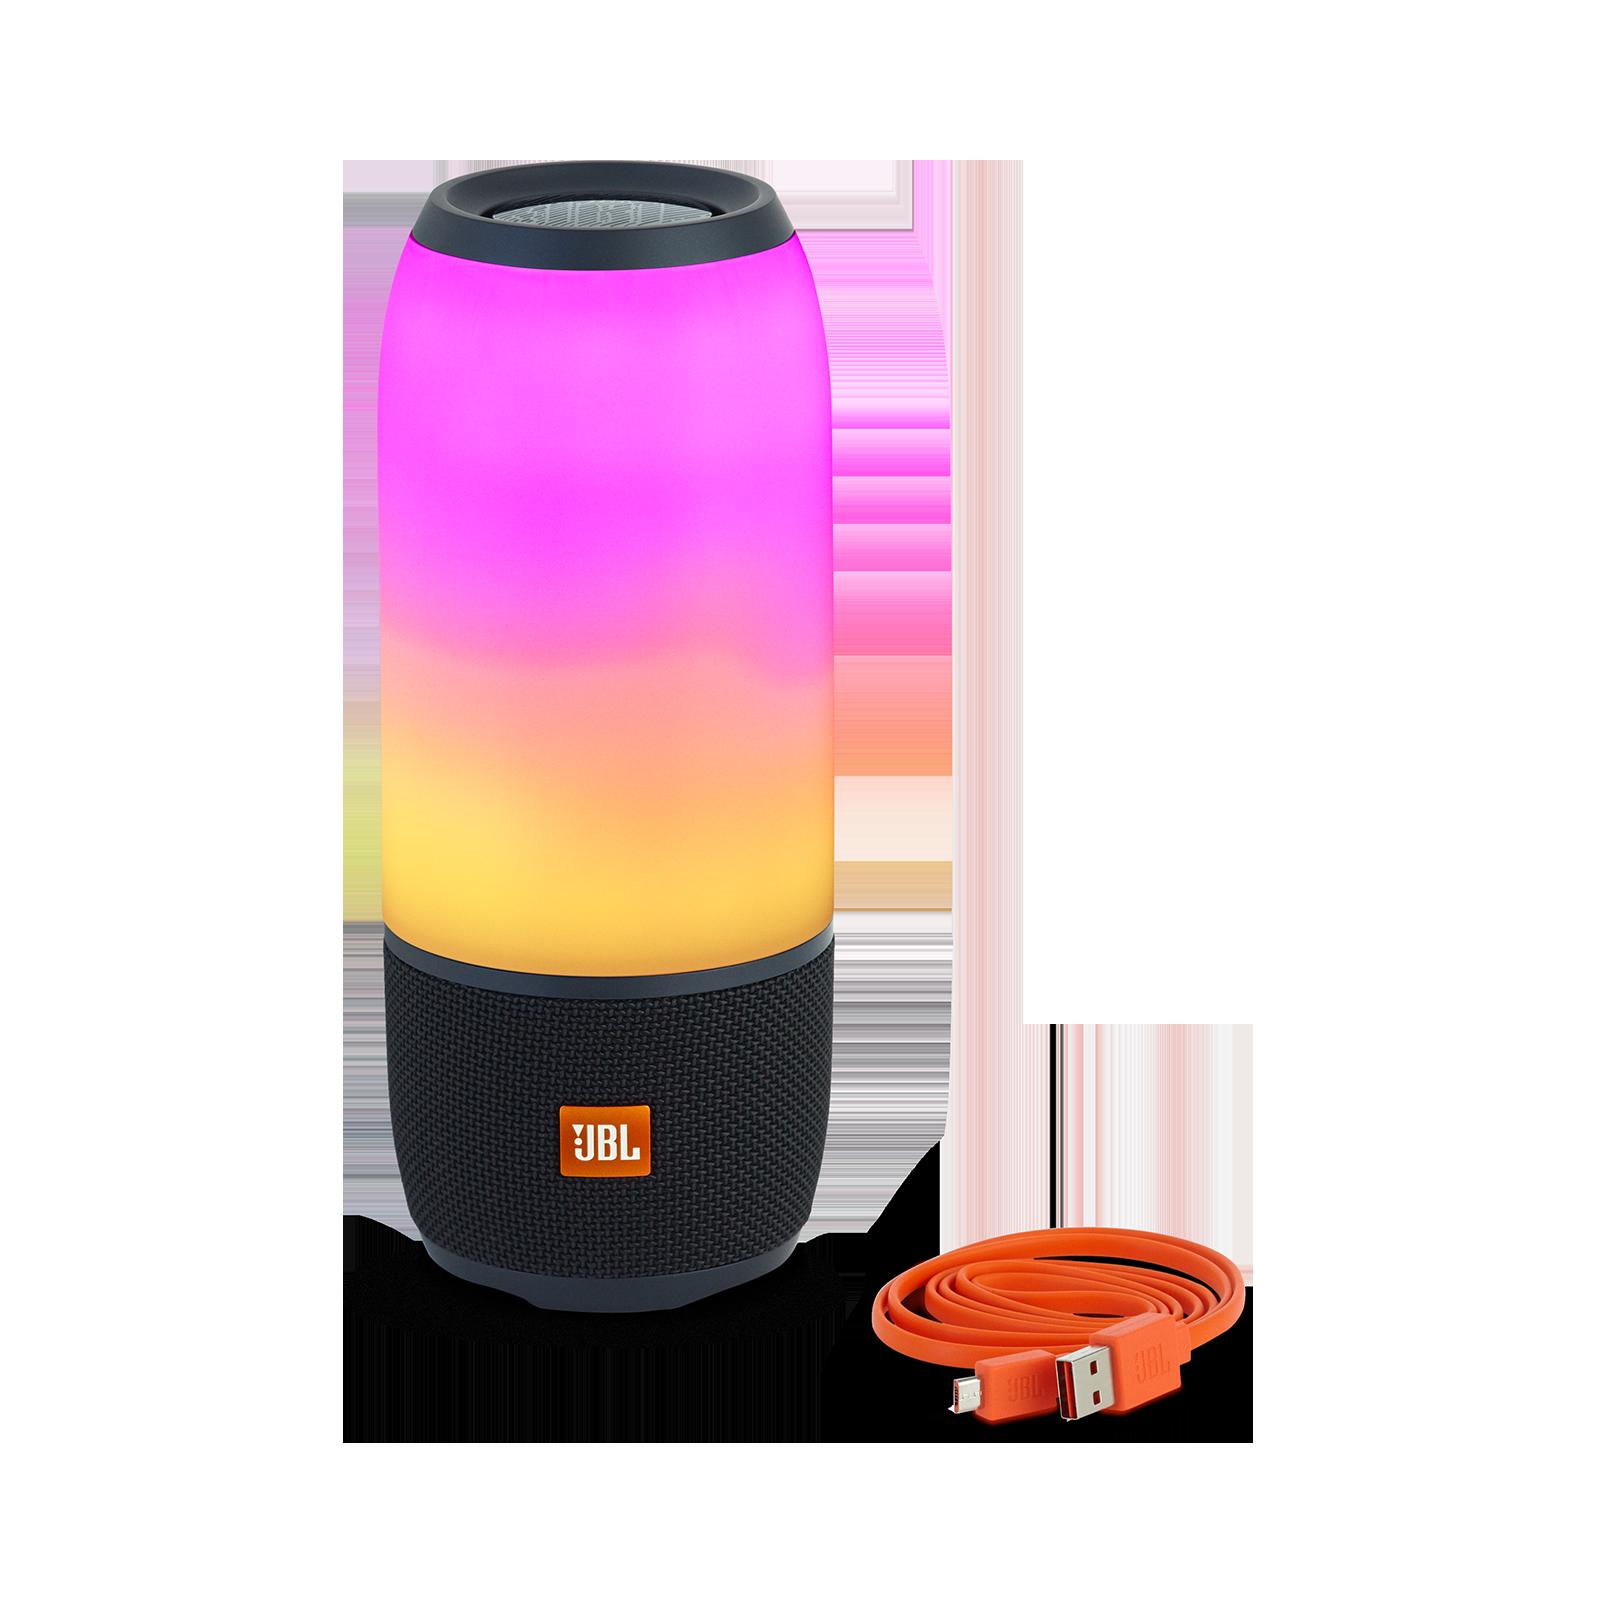 Pulse 3 - Black - Waterproof portable Bluetooth speaker with 360° lightshow and sound. - Detailshot 2